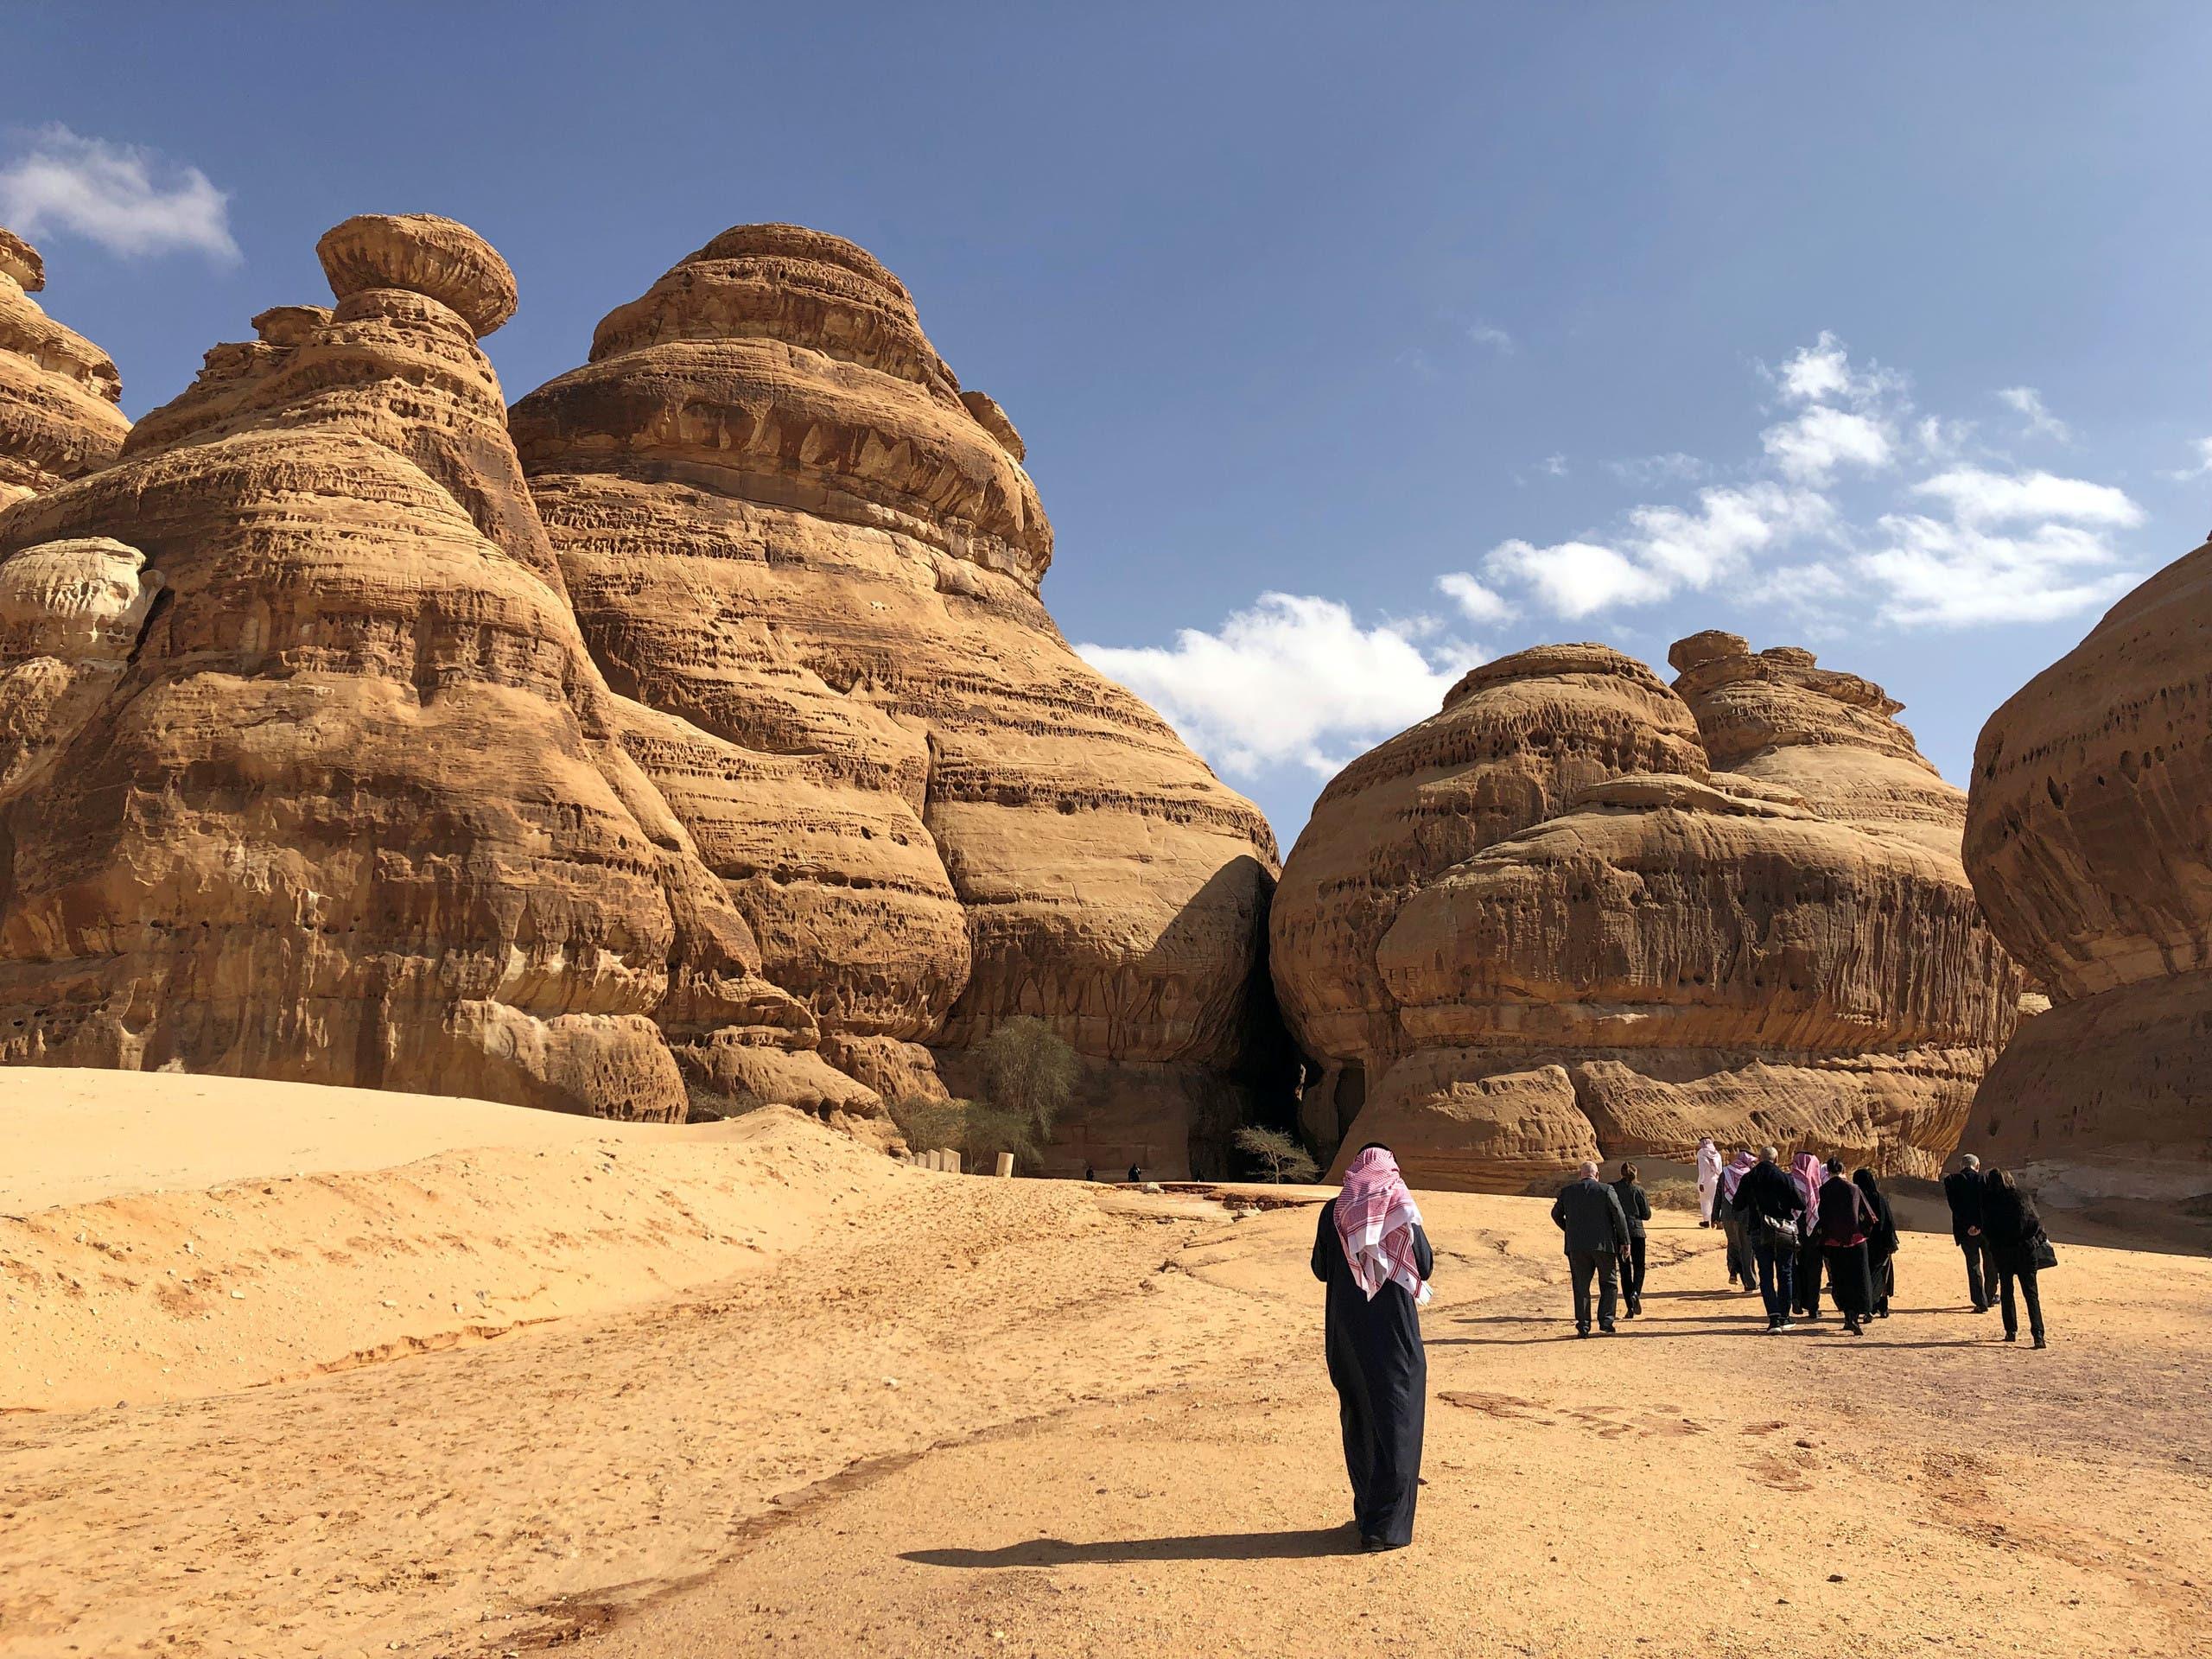 Visitors walk outside the tombs at the Madain Saleh antiquities site in al-Ula, Saudi Arabia February 10, 2019. (Reuters)